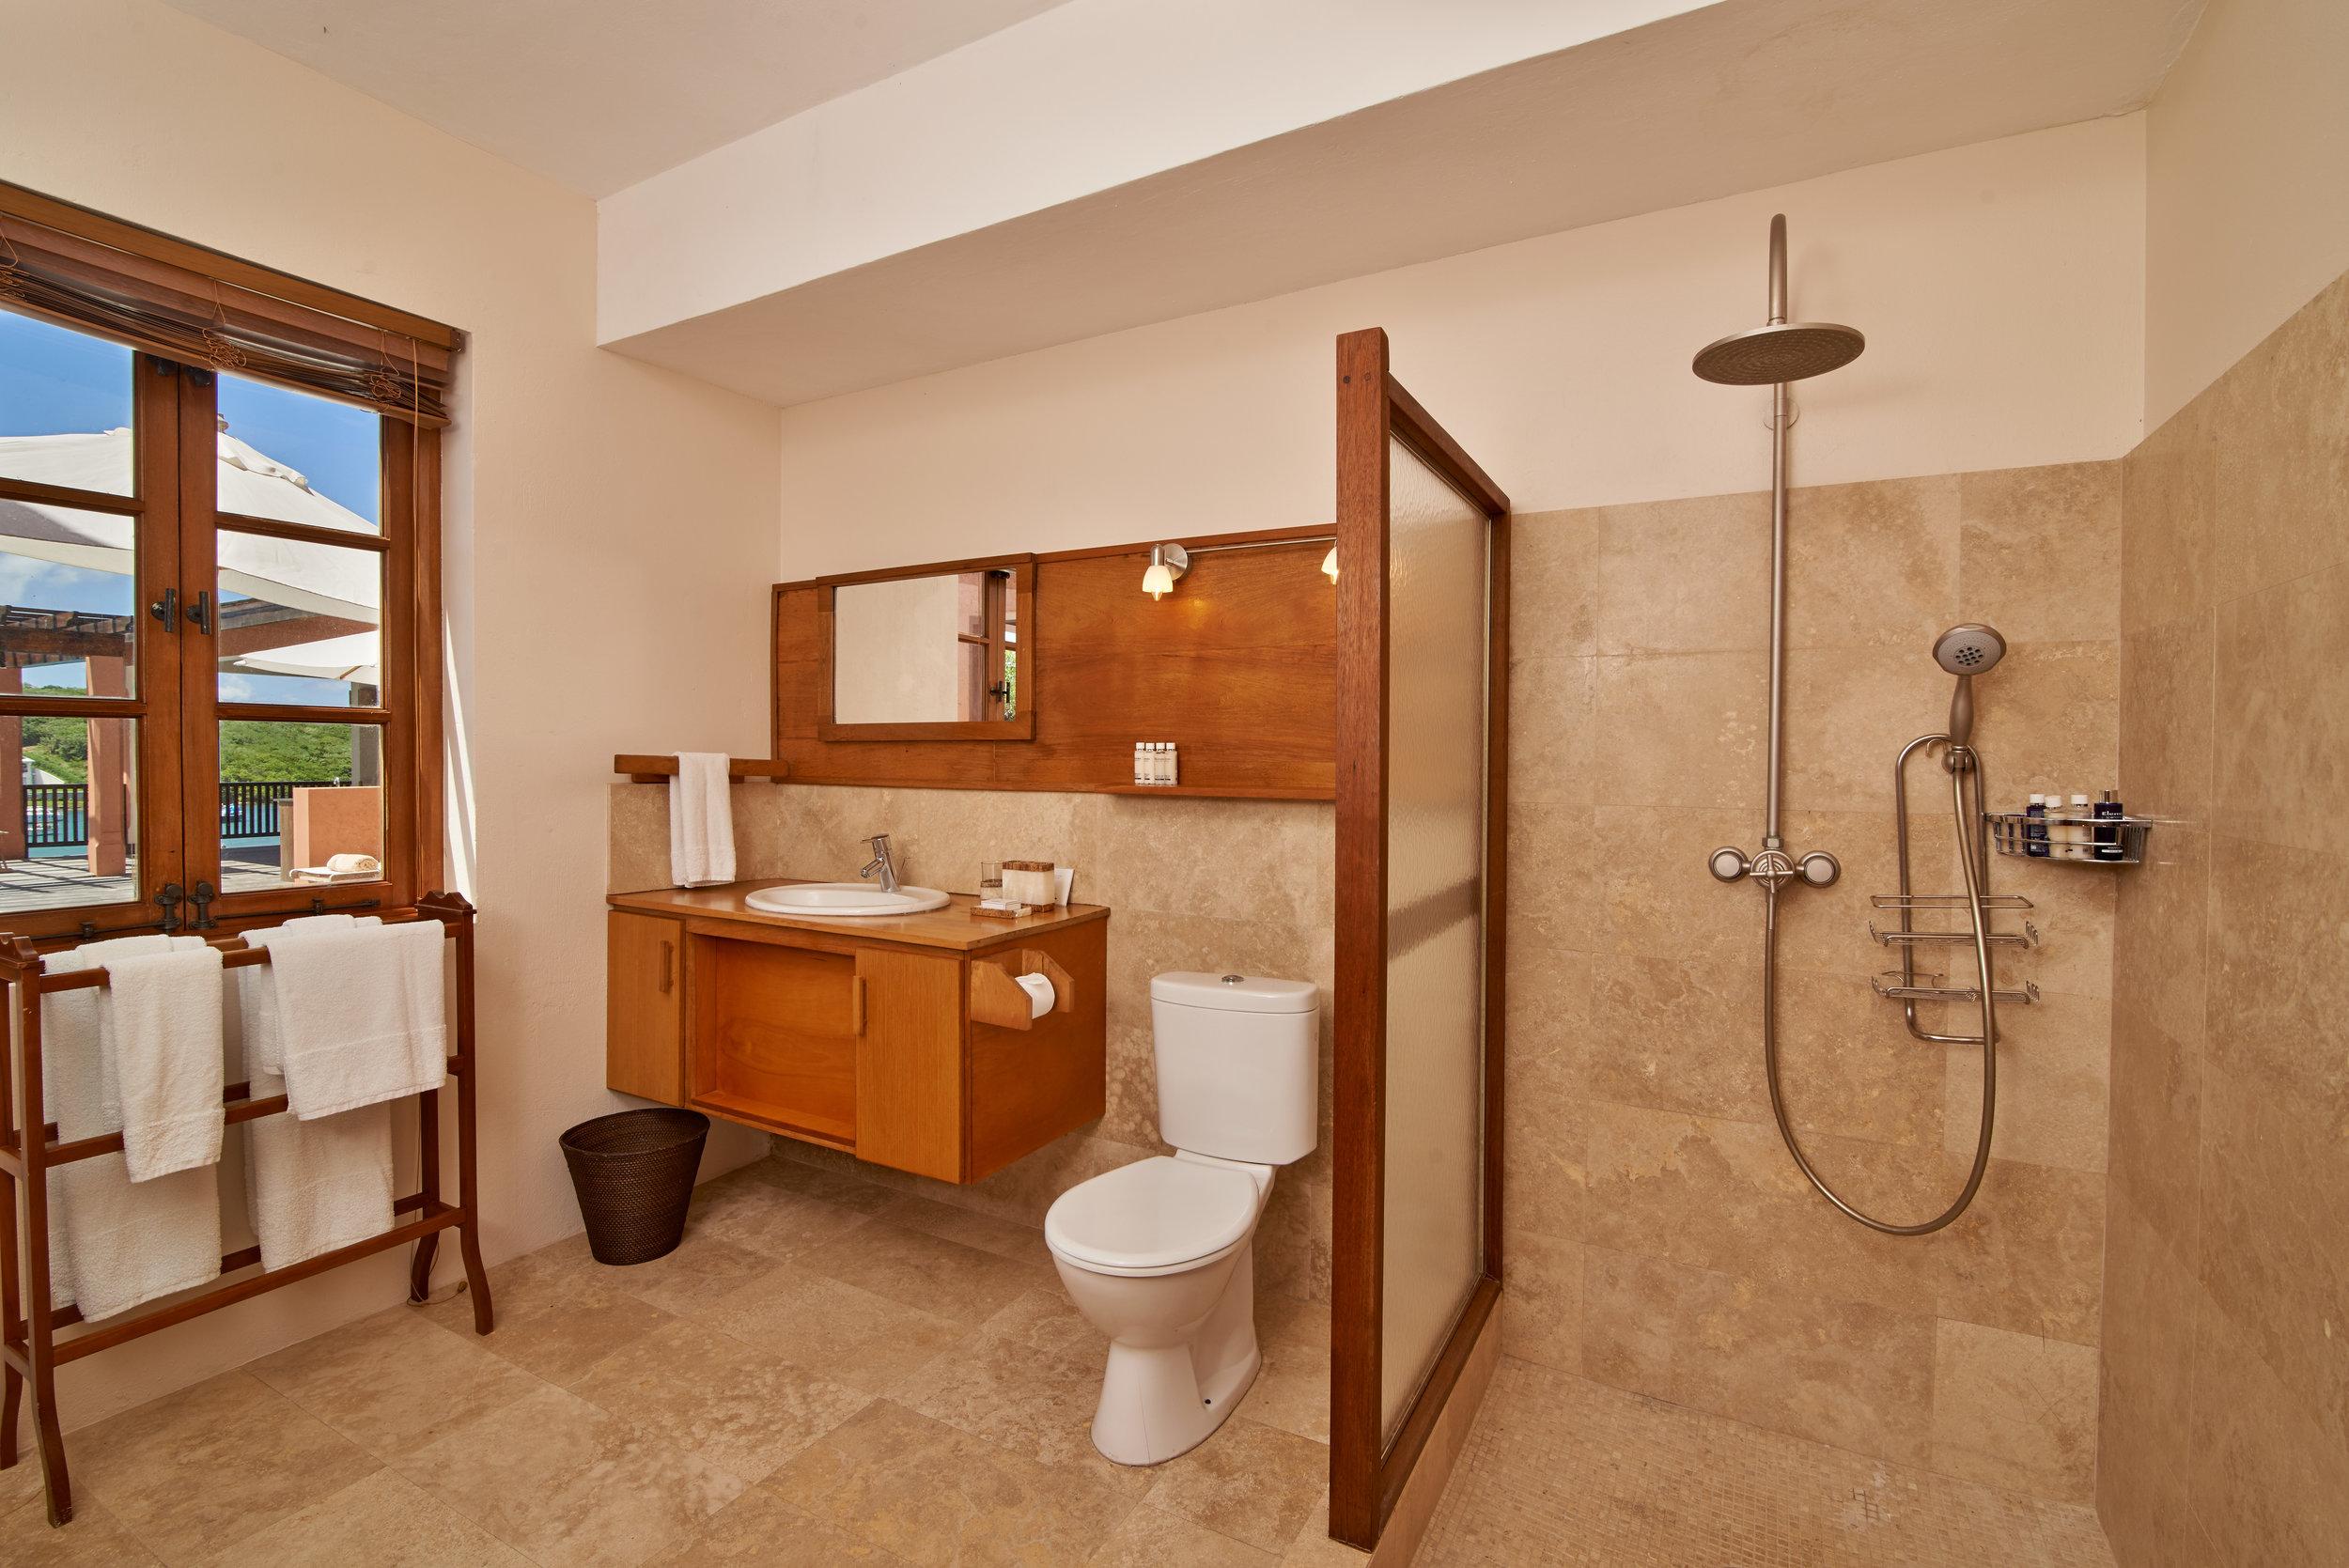 PoolHouse_bedroom1_bathroom.jpg